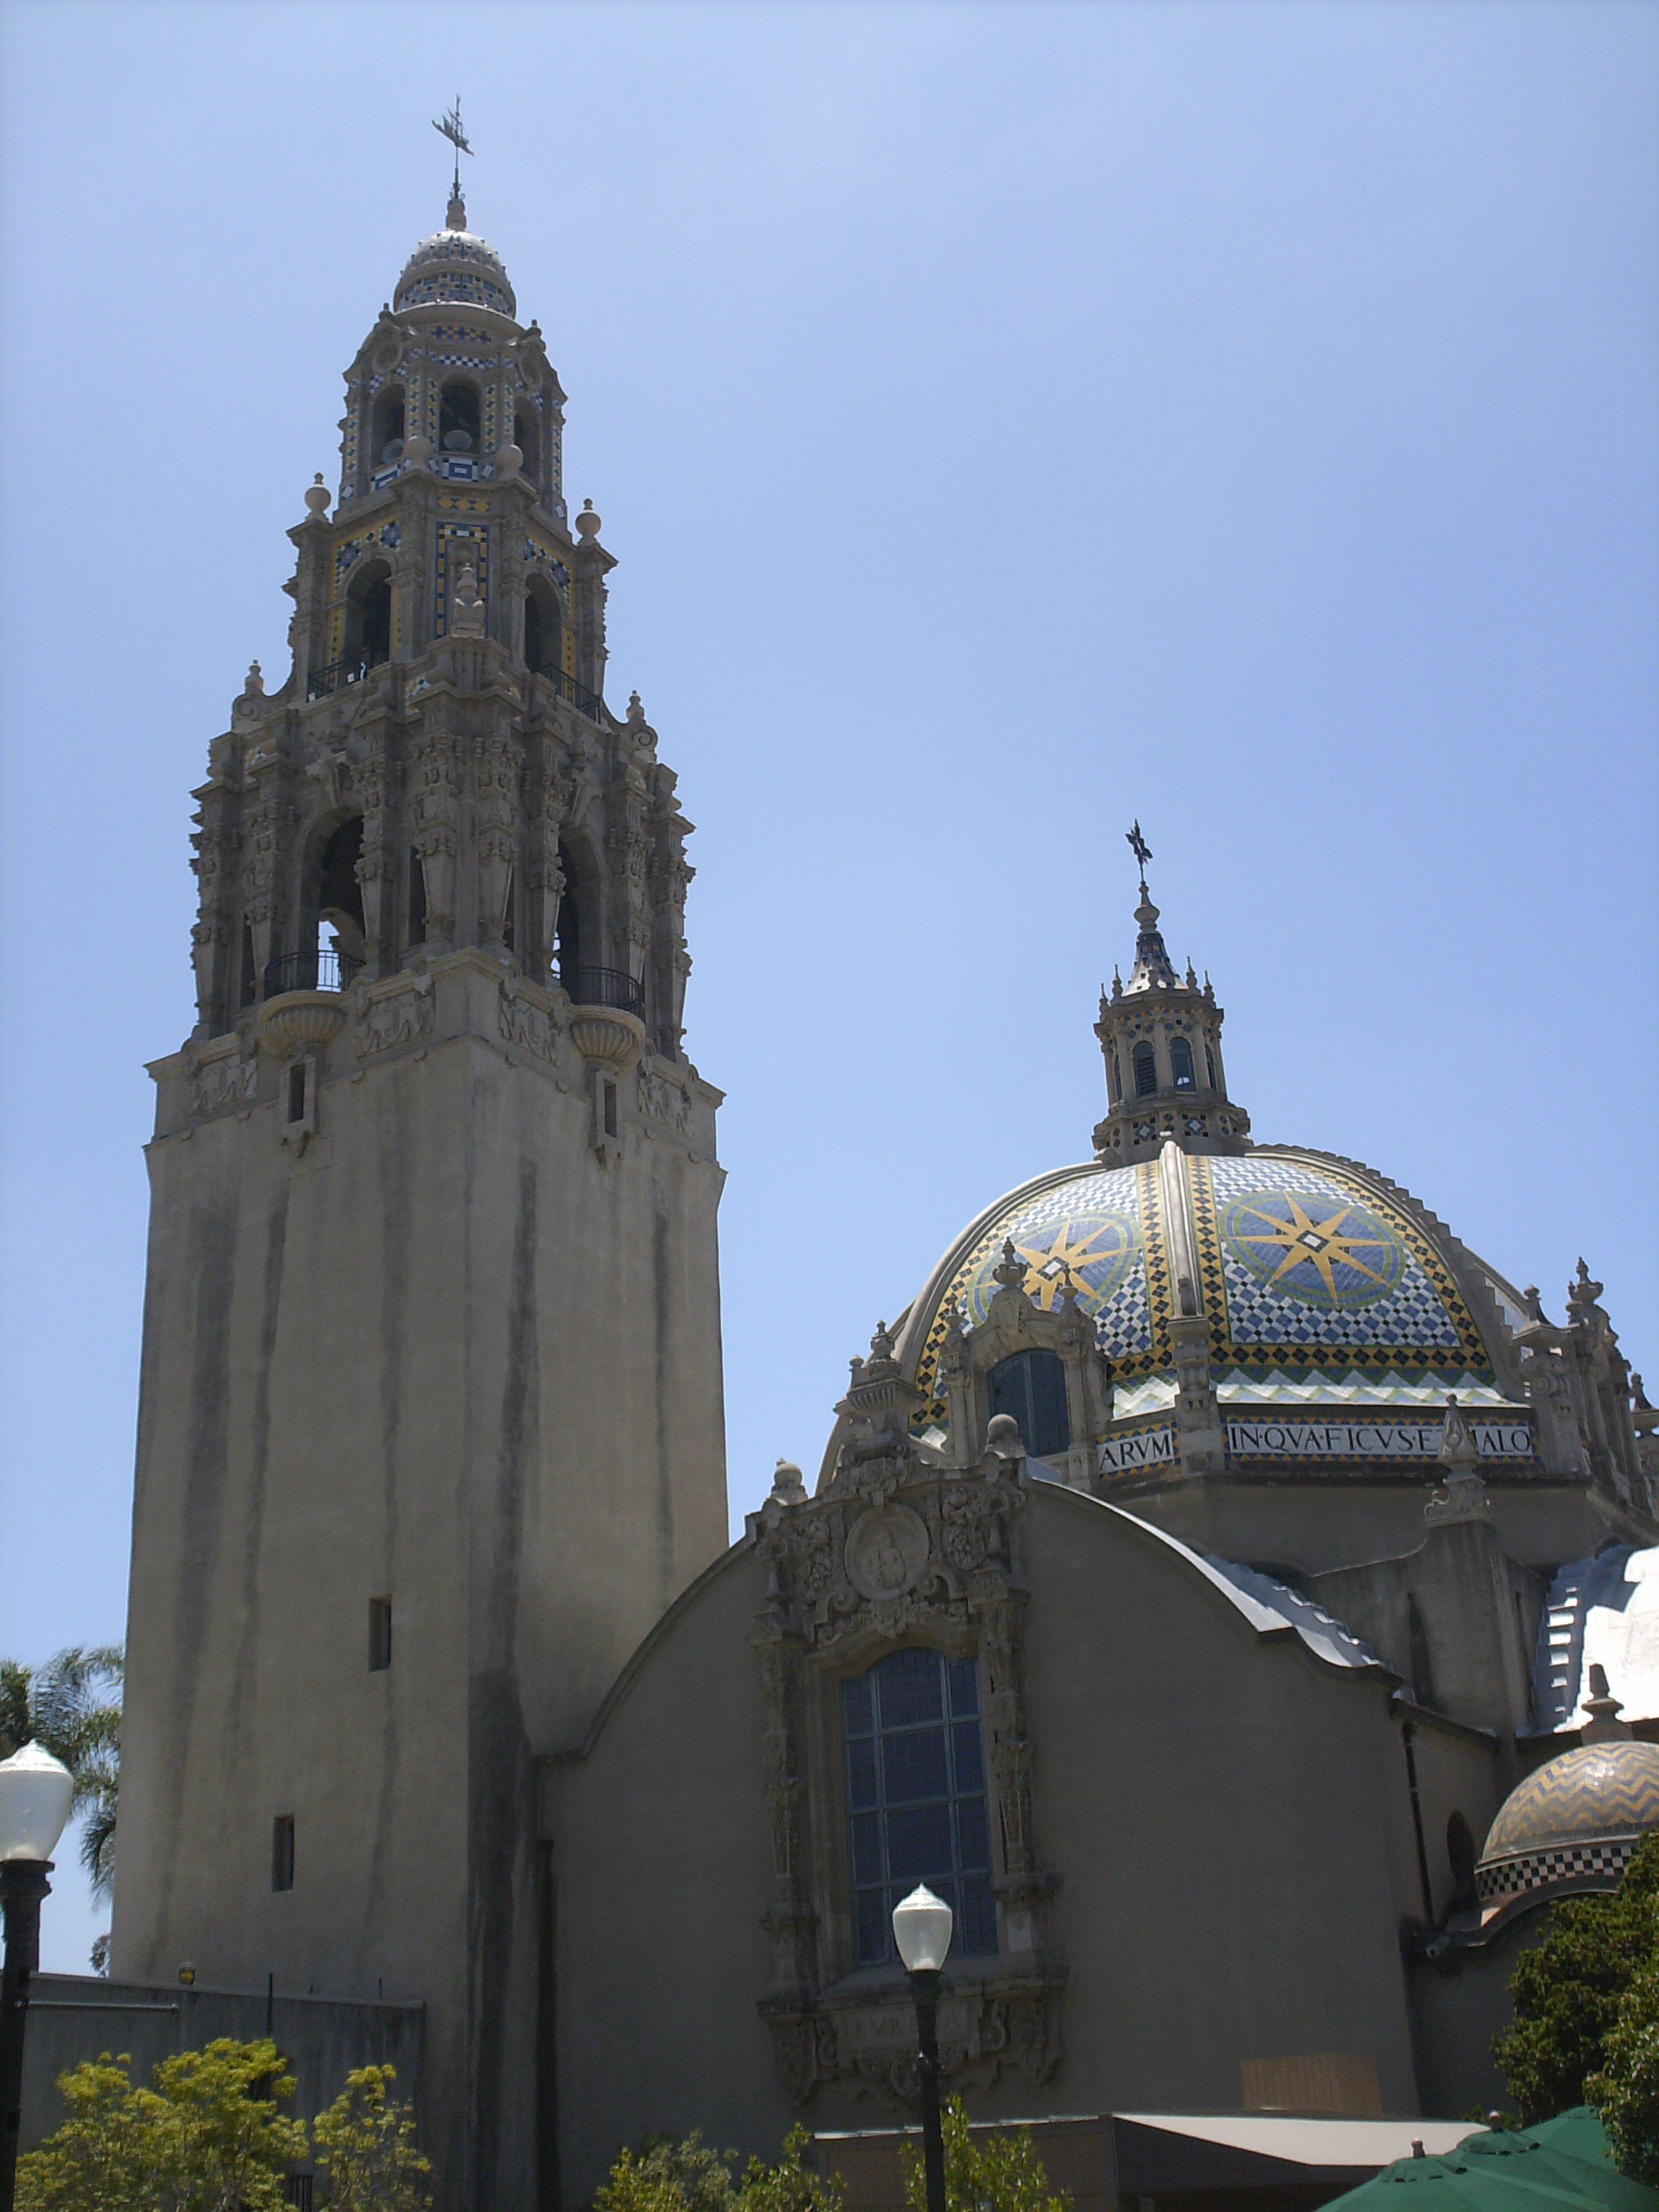 File:San Diego Museum of Man building.jpg - Wikimedia Commons